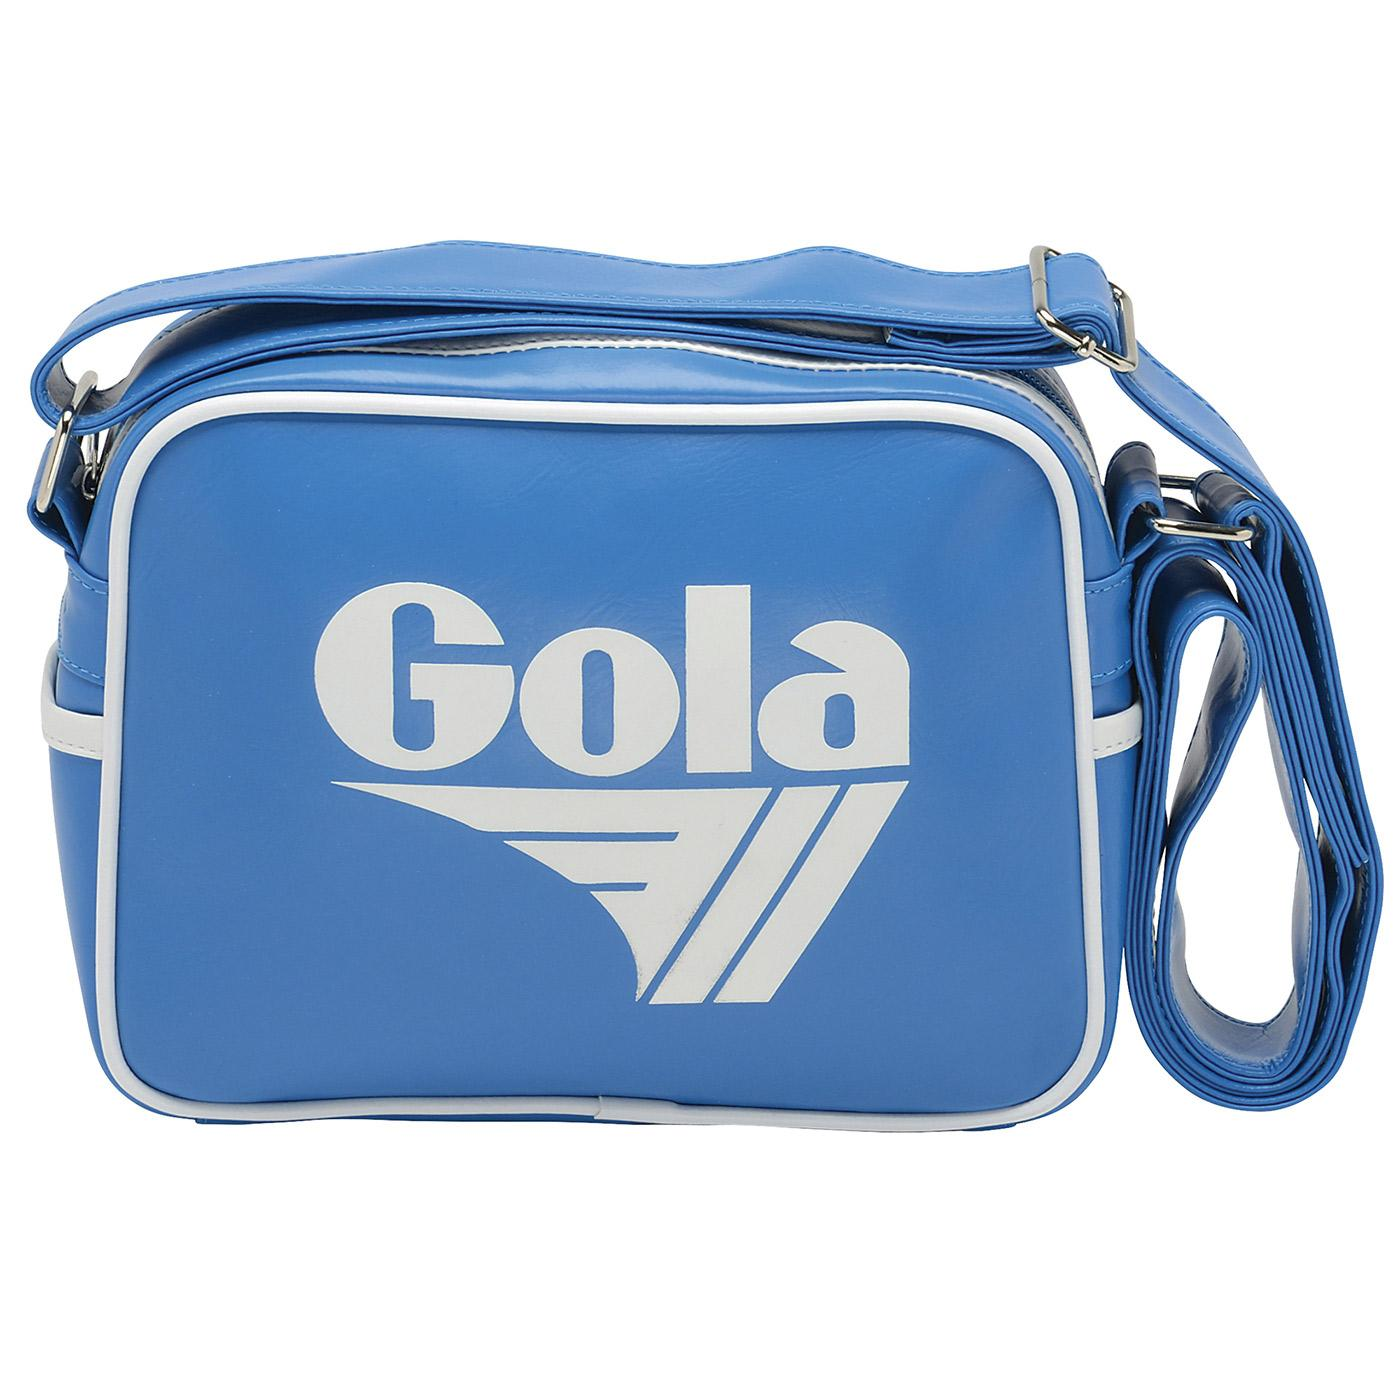 GOLA Micro Redford Retro Shoulder Bag (Blue/White)